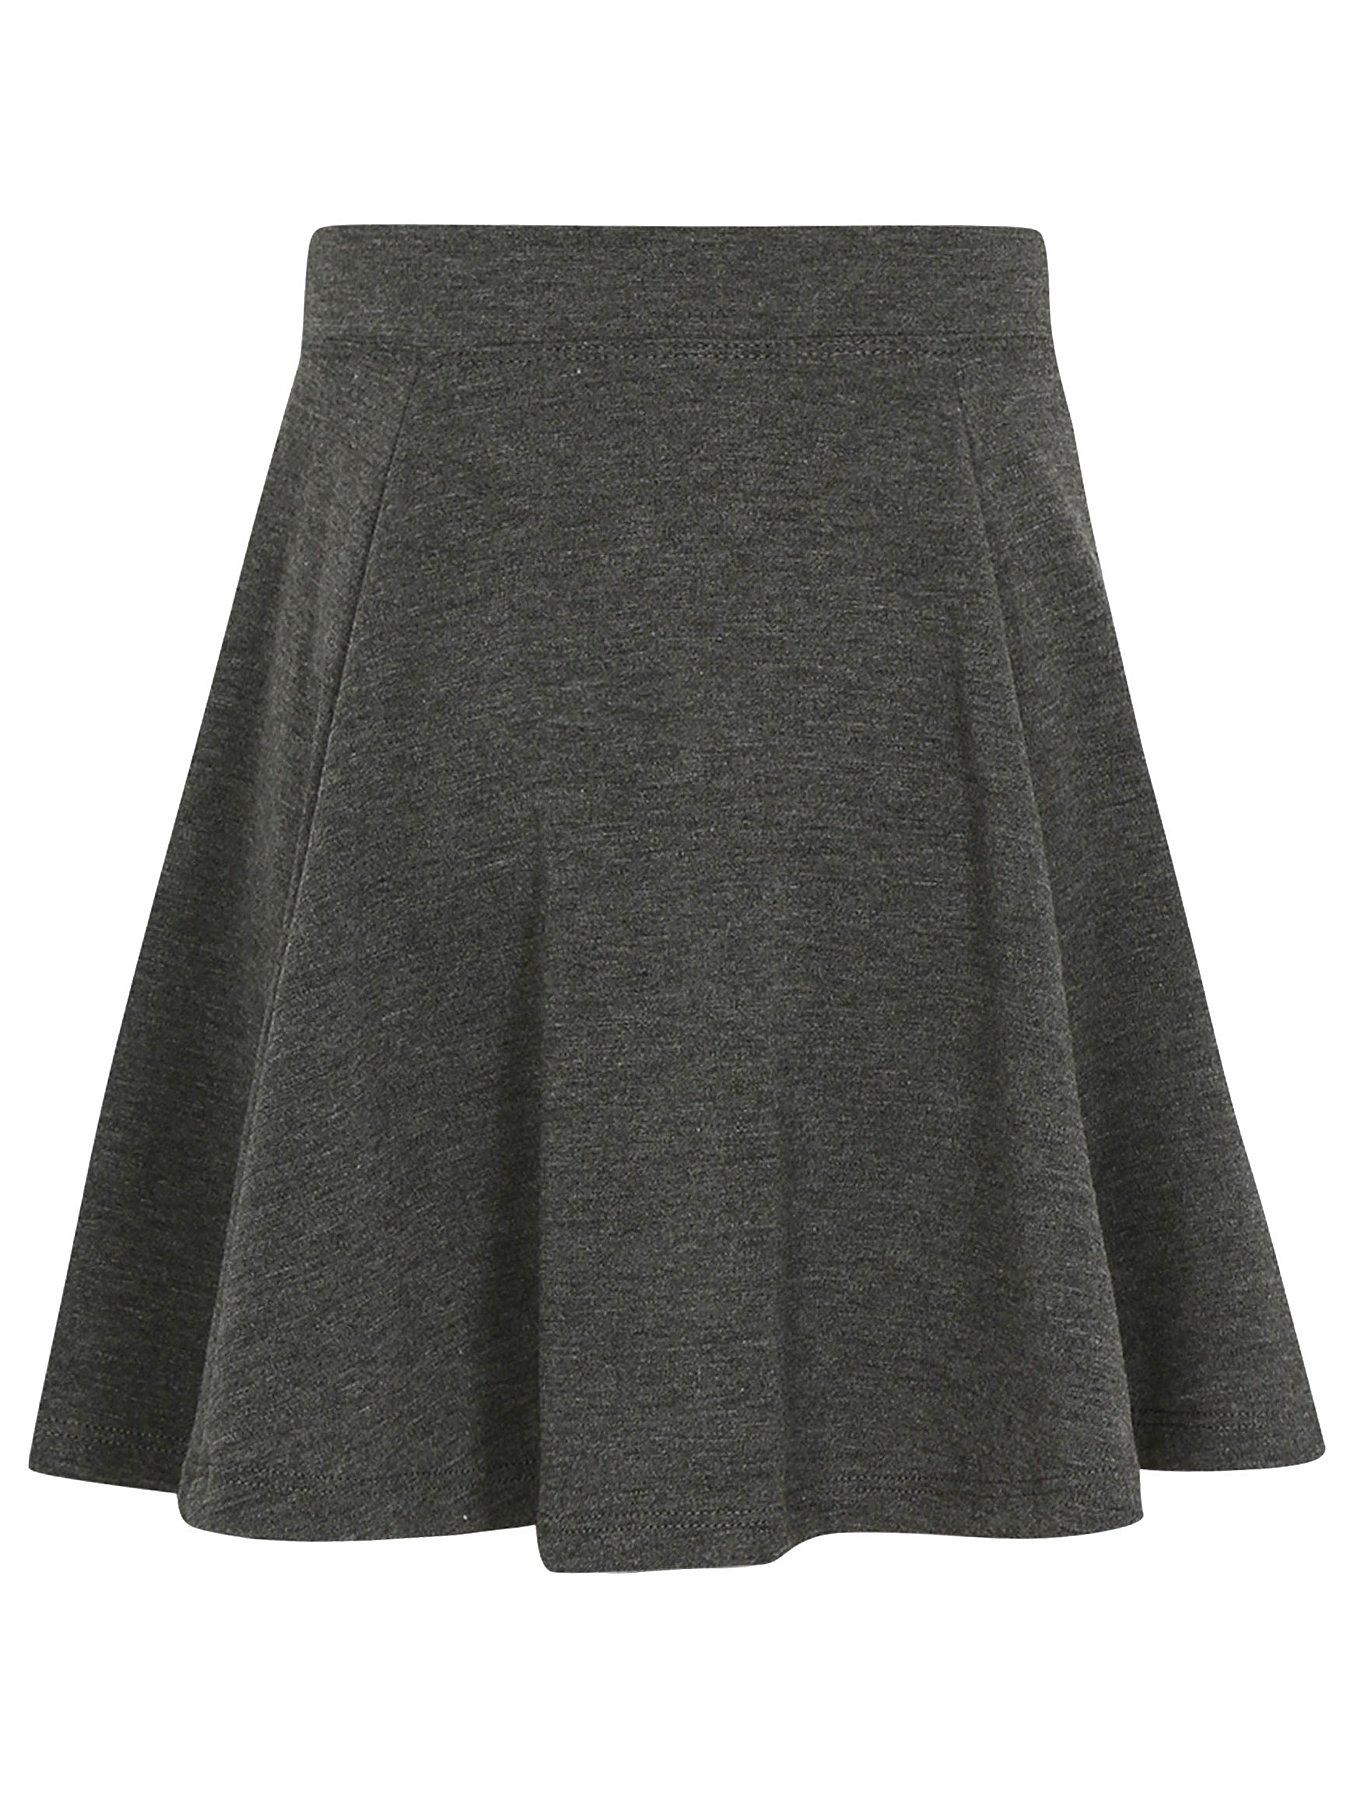 6290599a85 Girls School Jersey Skater Skirt – Grey | School | George at ASDA